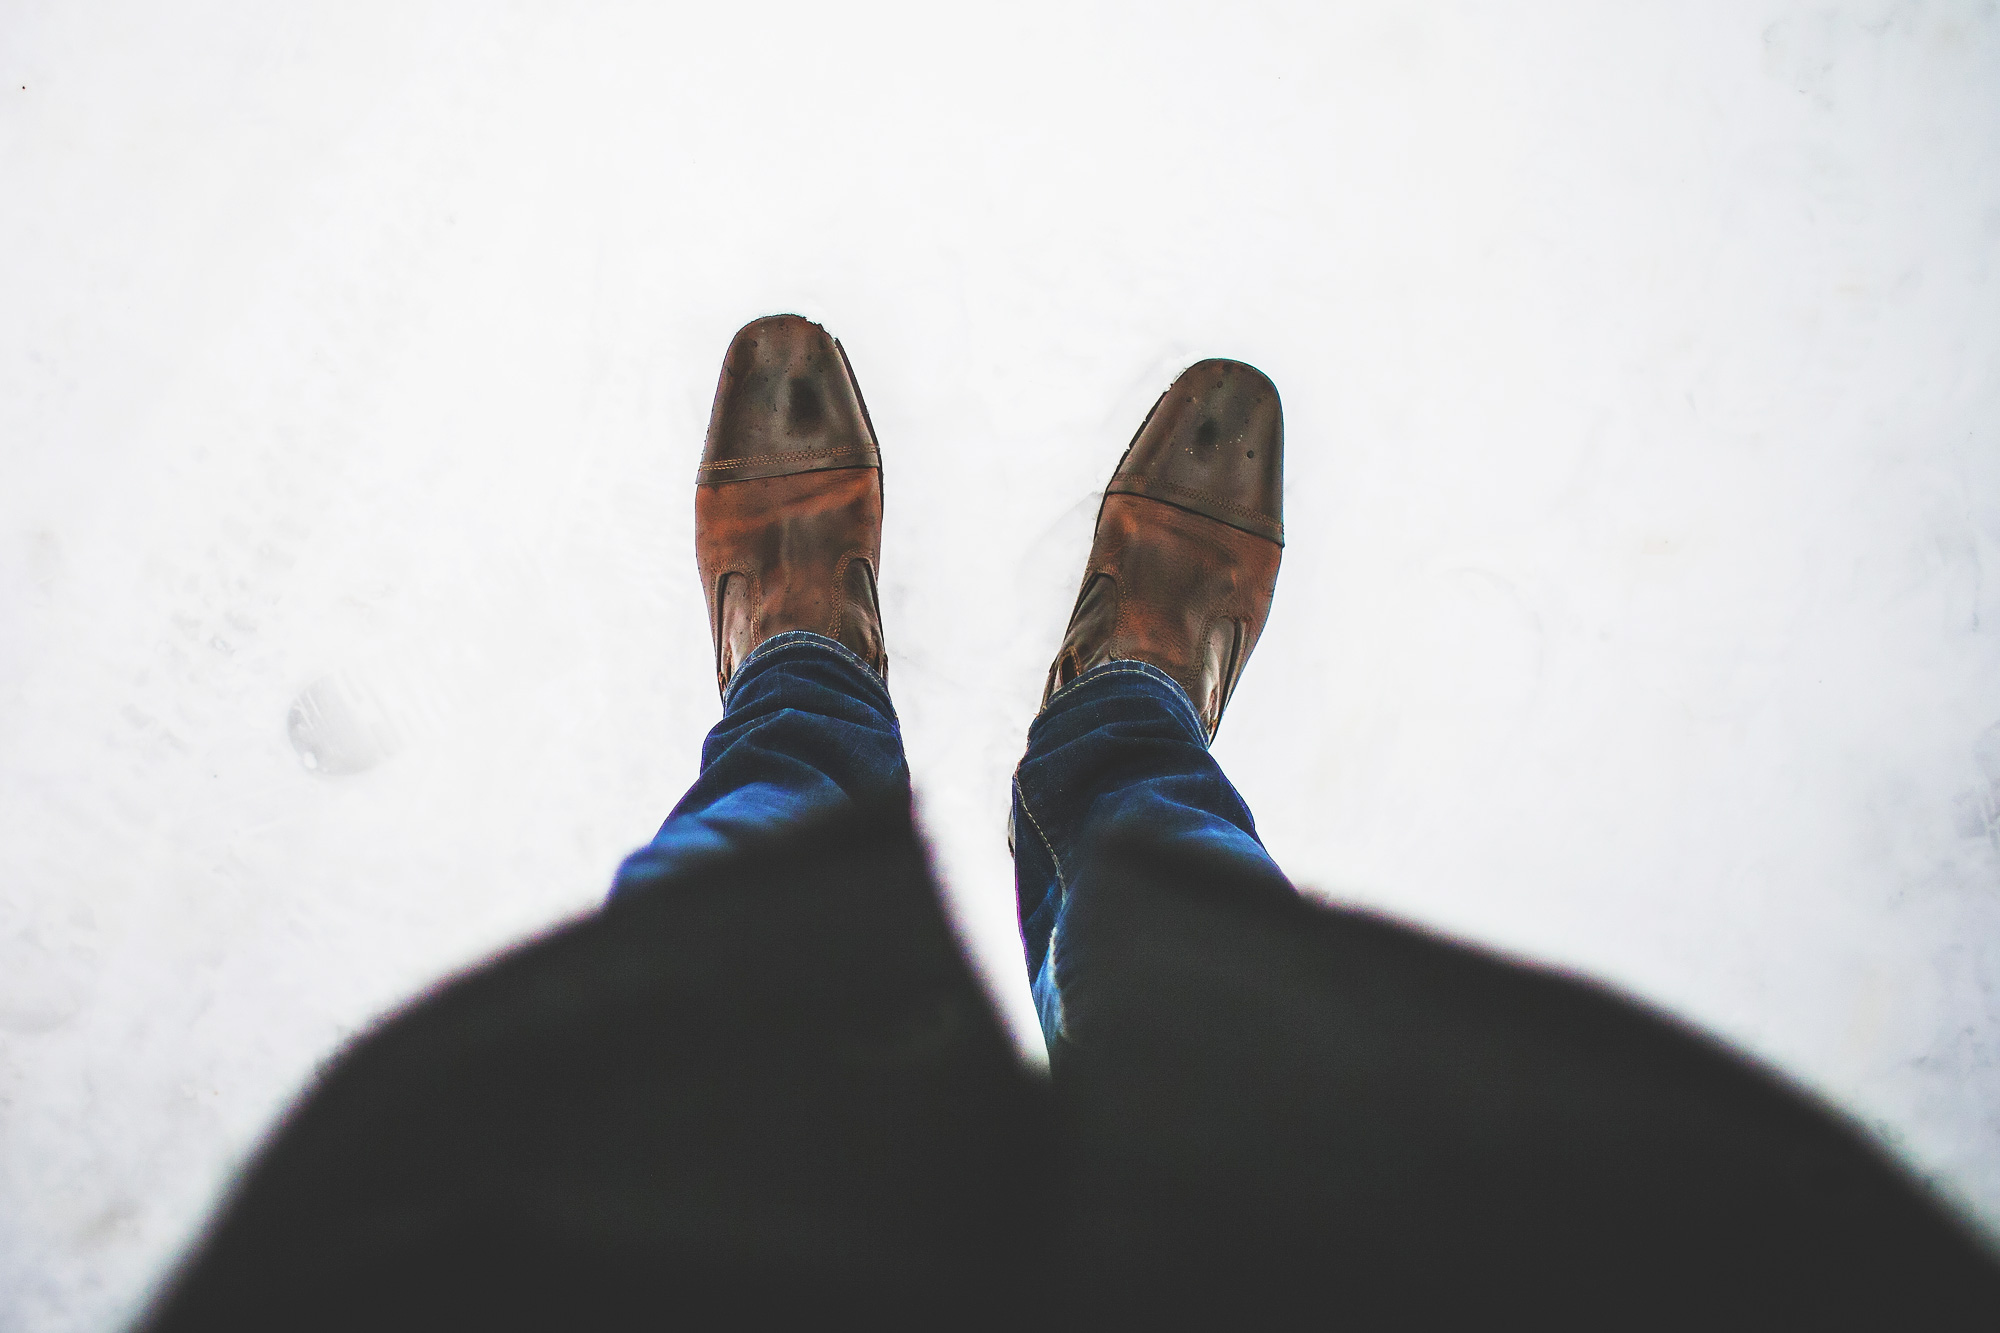 Feet-01